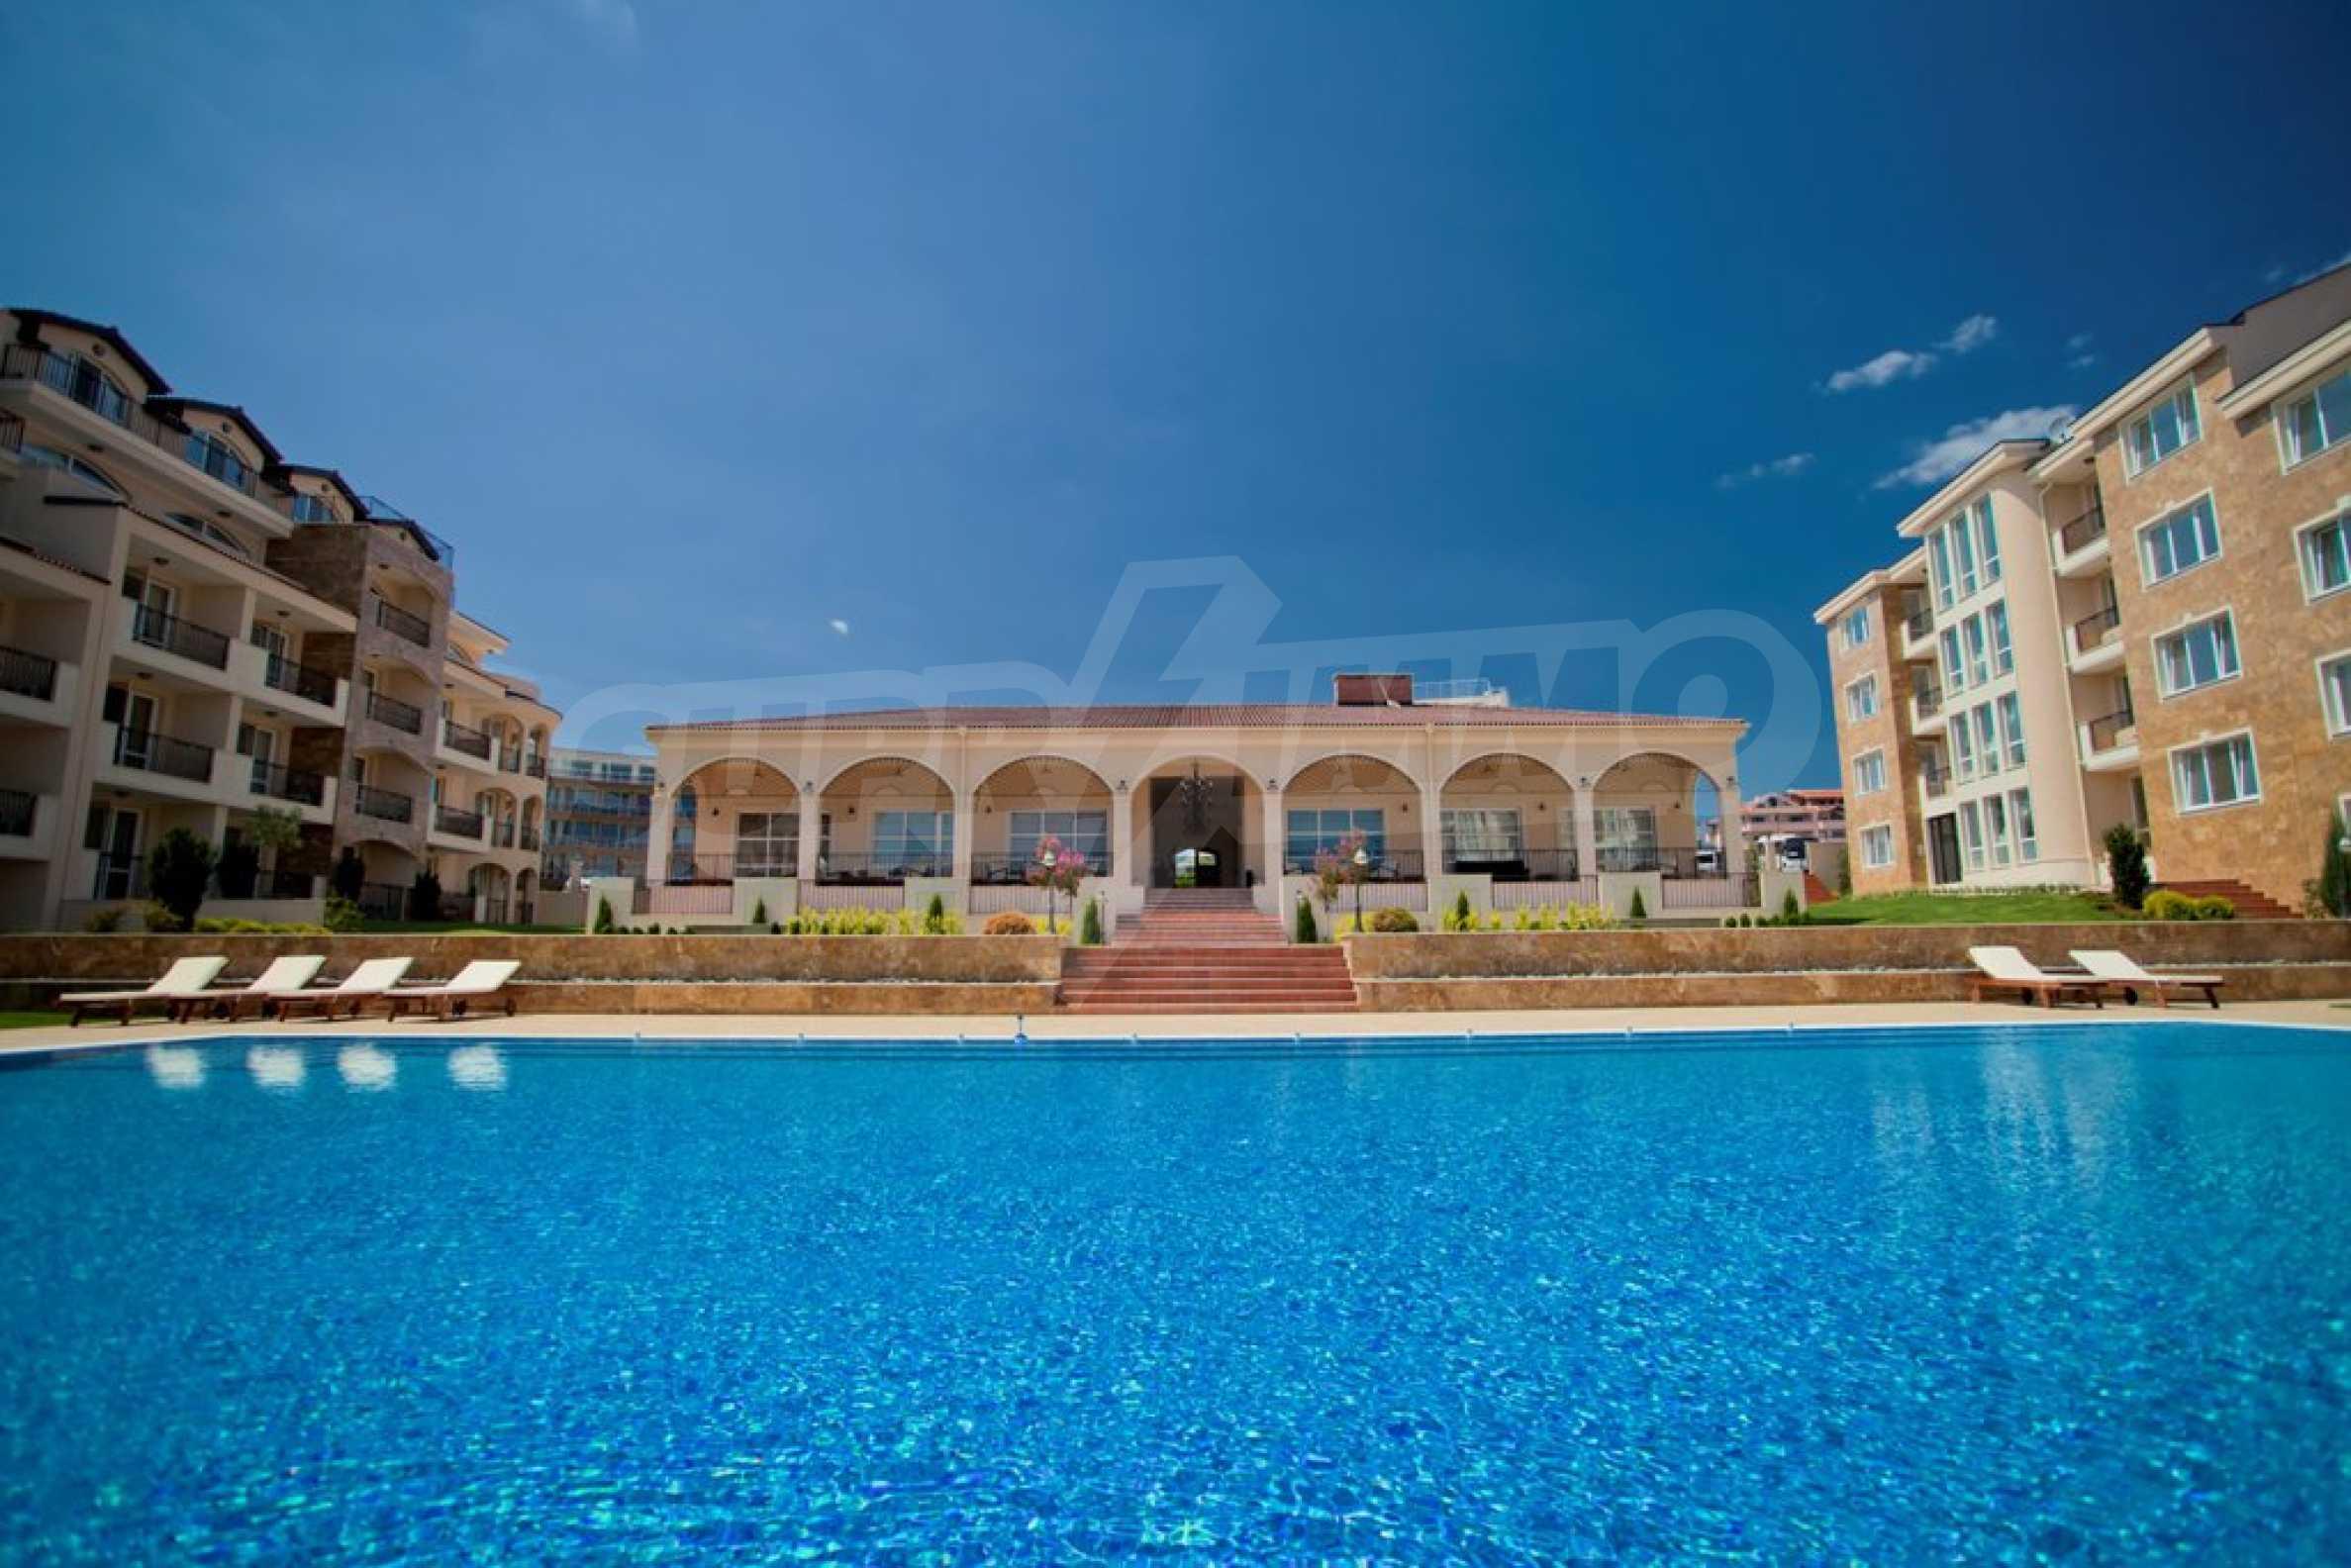 New apartment complex Atia resort in Chernomorets 7